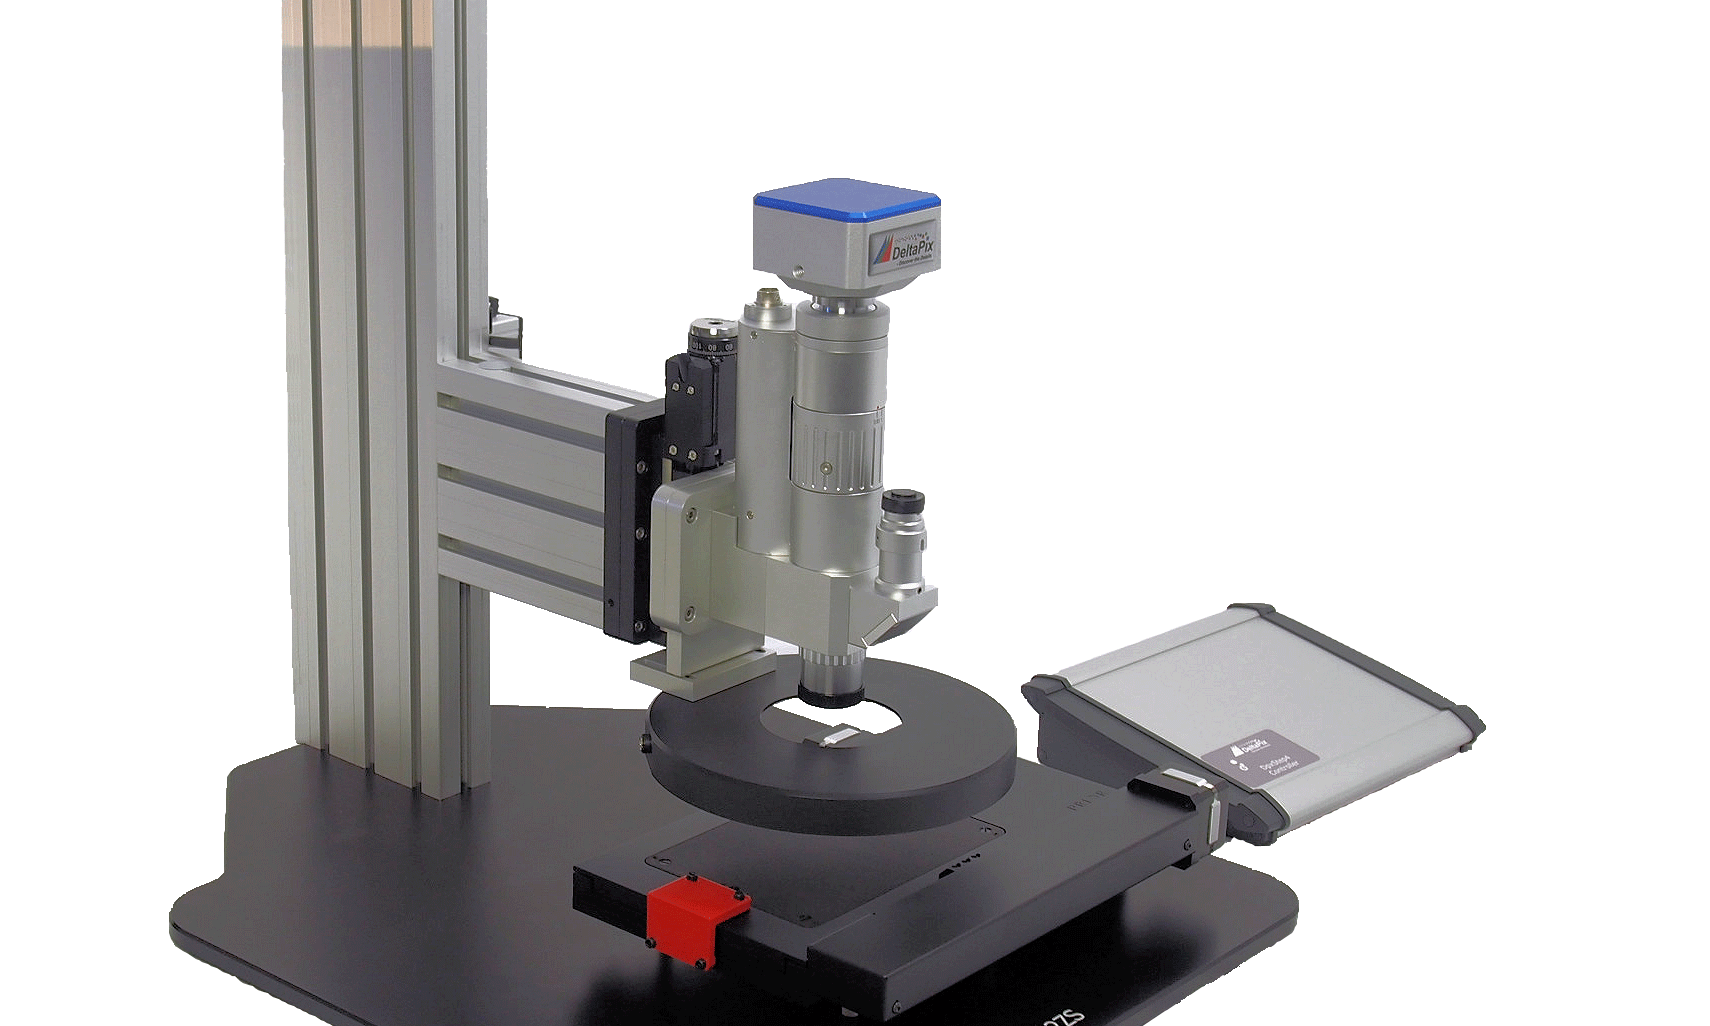 Digital microscope with 12X zoom